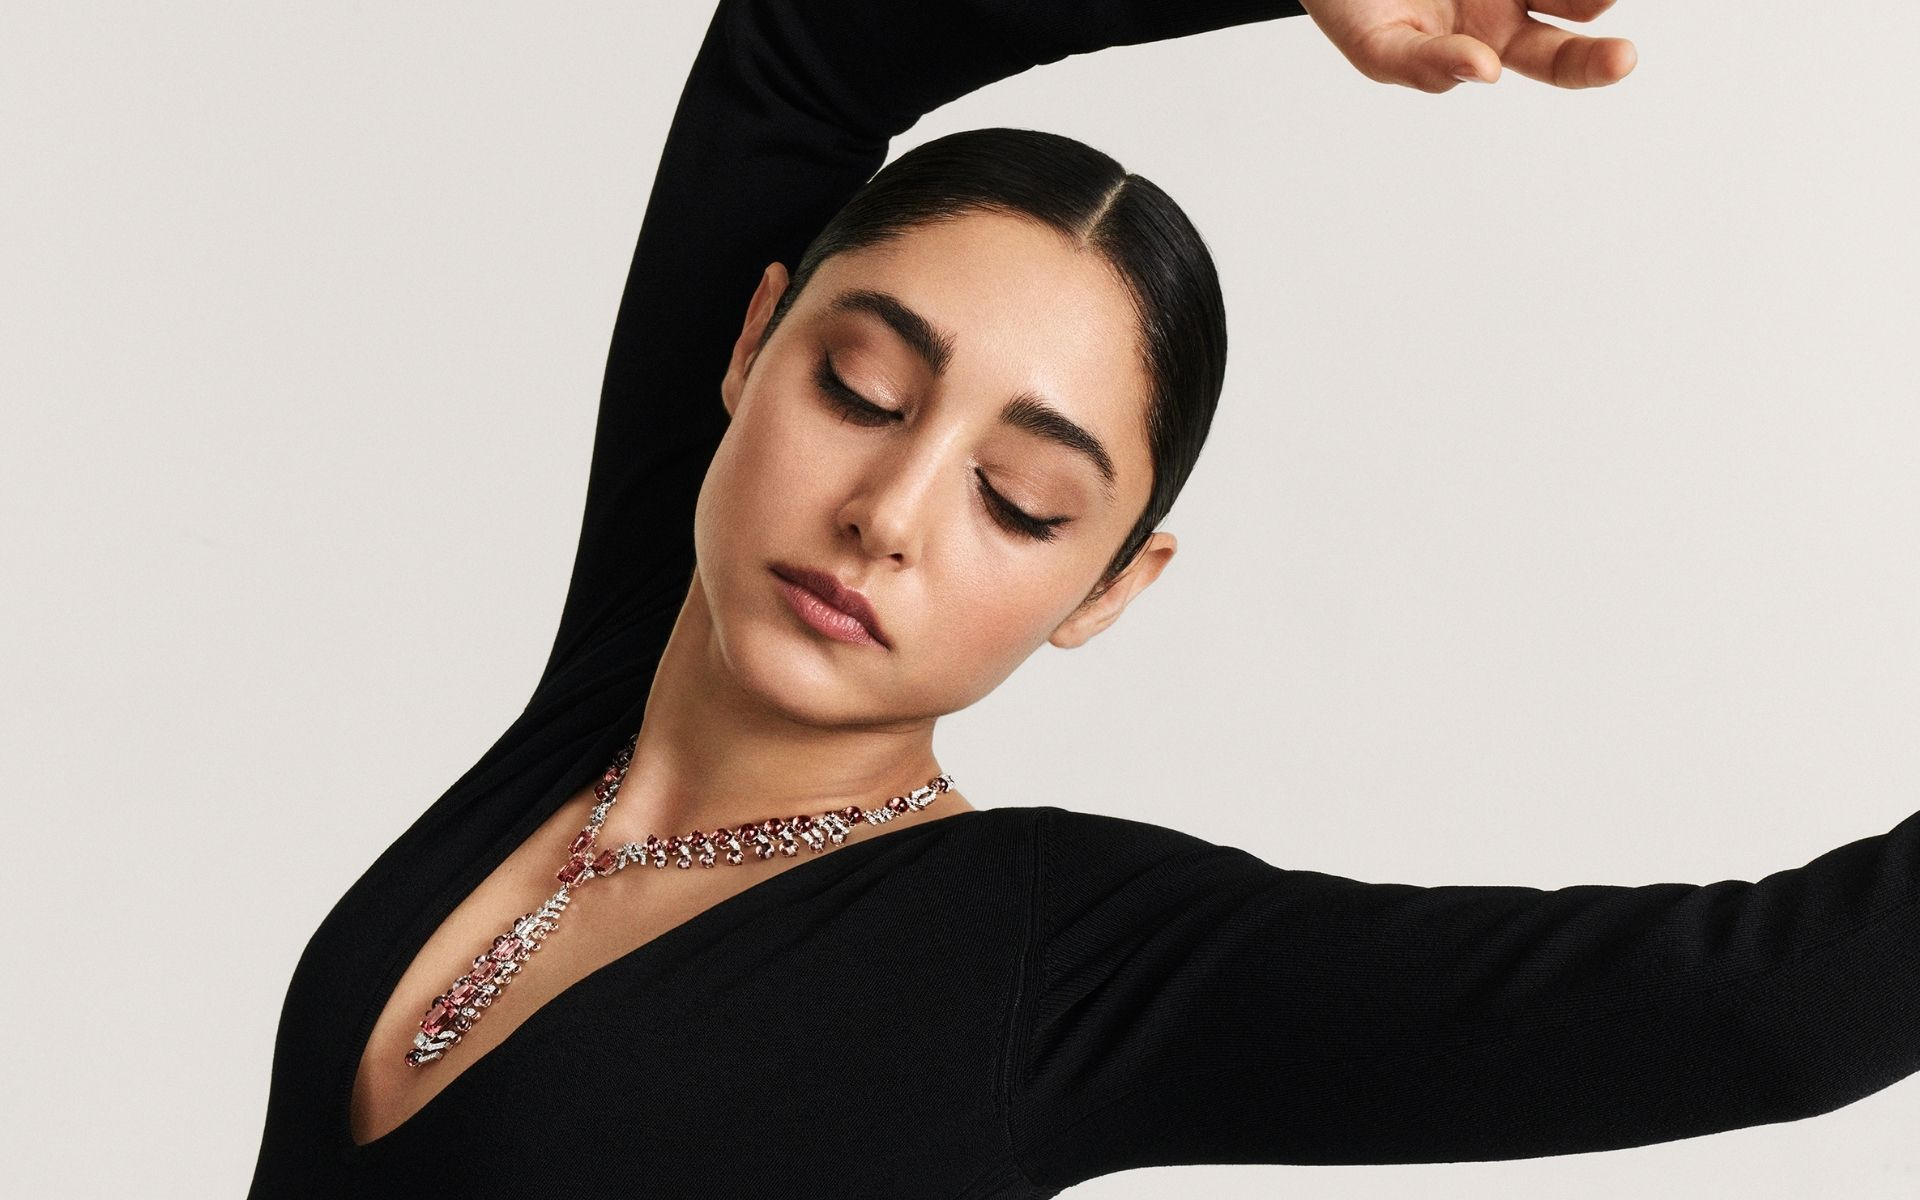 An Inside Look at Cartier's Stunning Sixième Sens High Jewellery Collection